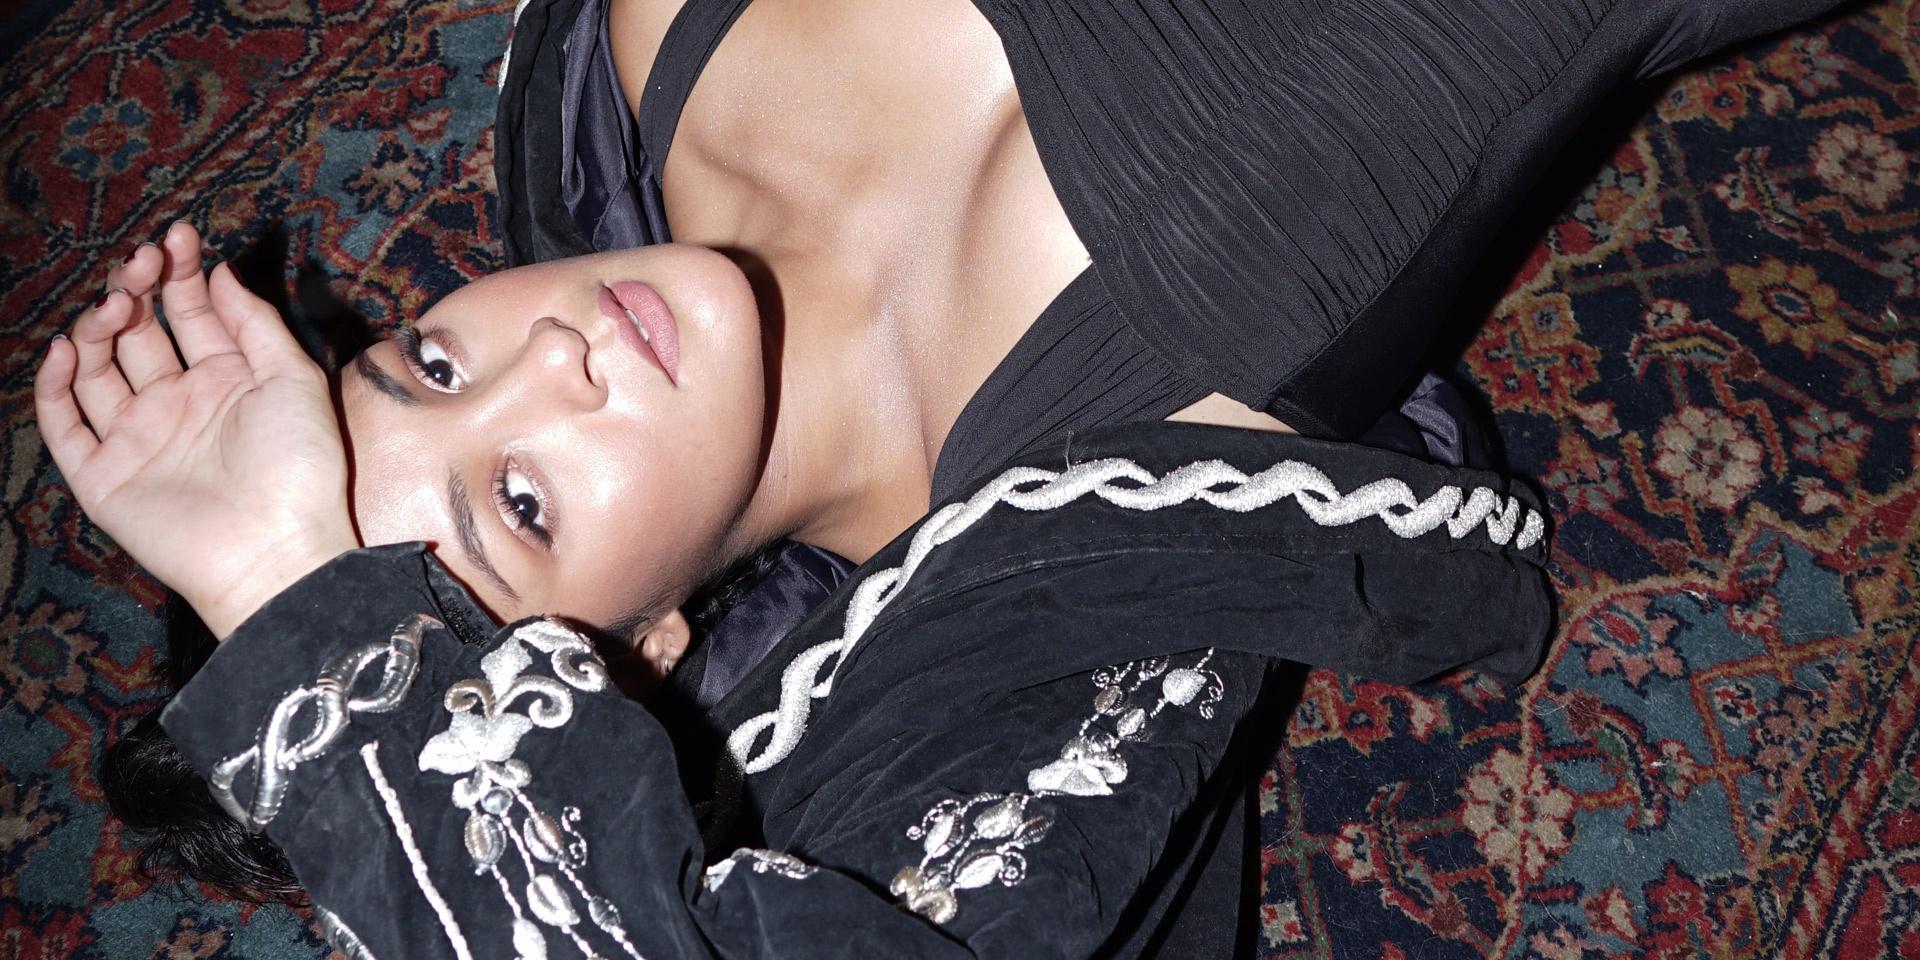 Kiana Valenciano drops fearless debut album See Me – listen